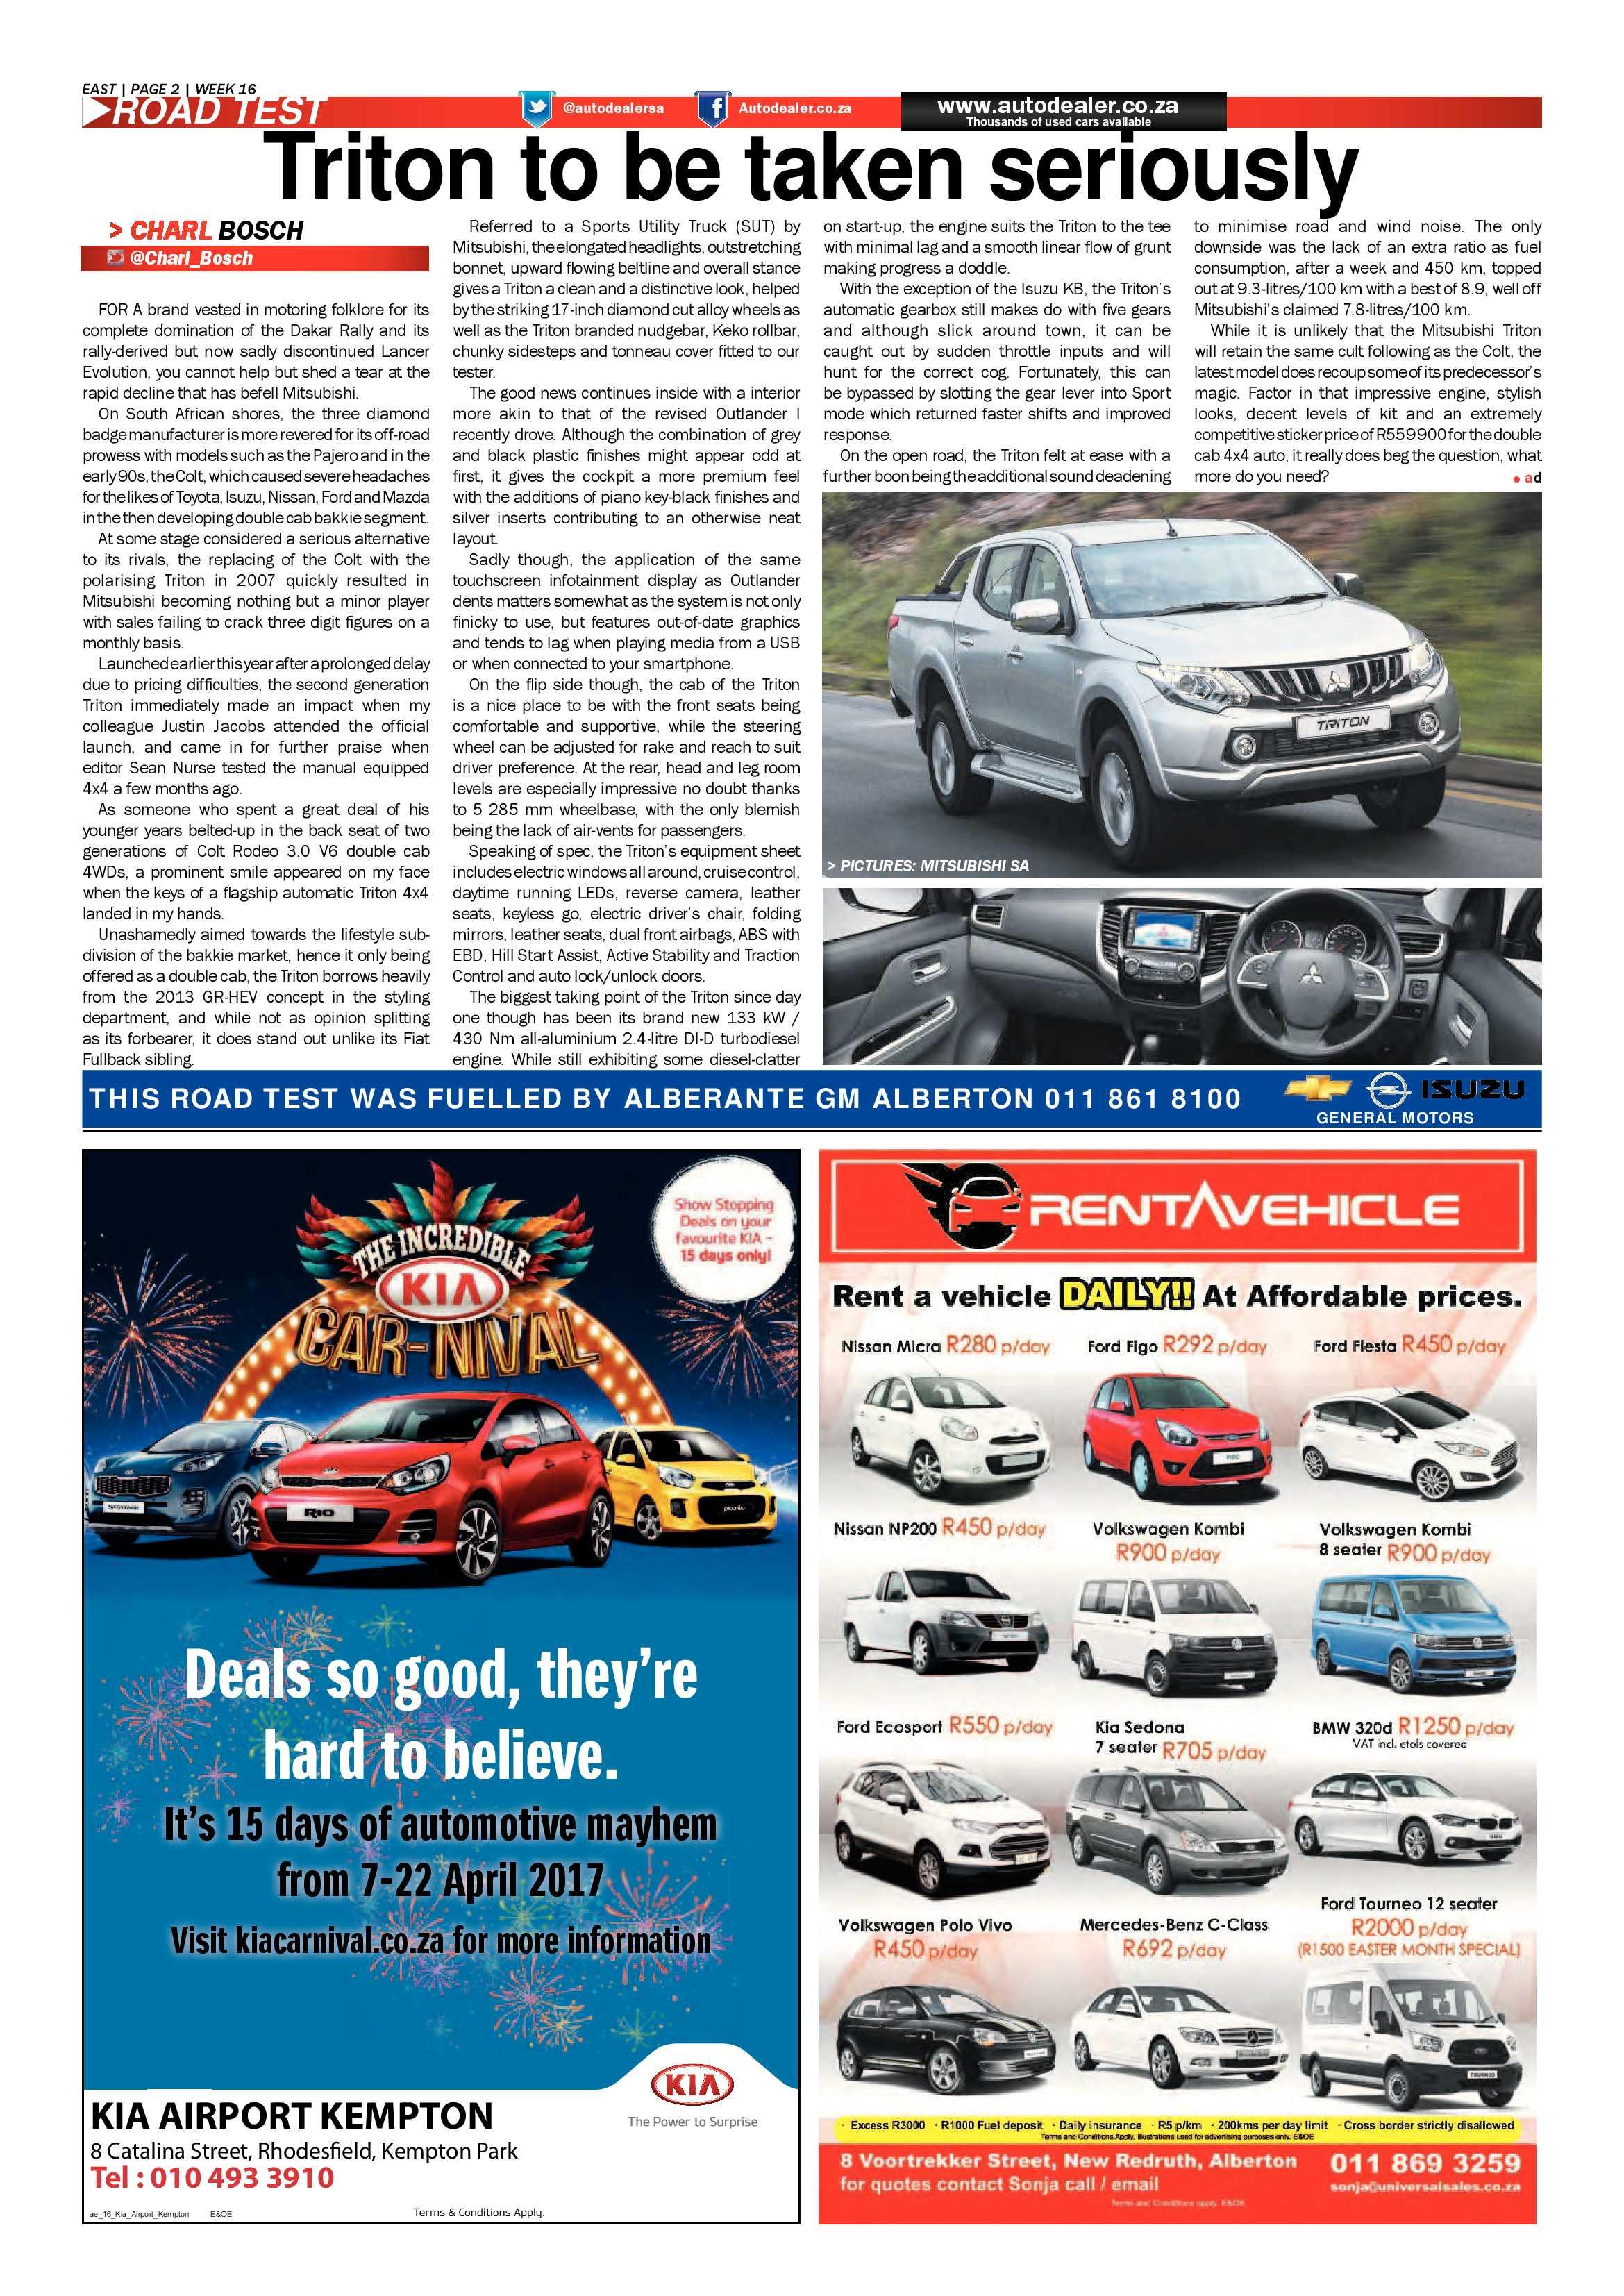 germiston-city-news-19-april-2017-epapers-page-22